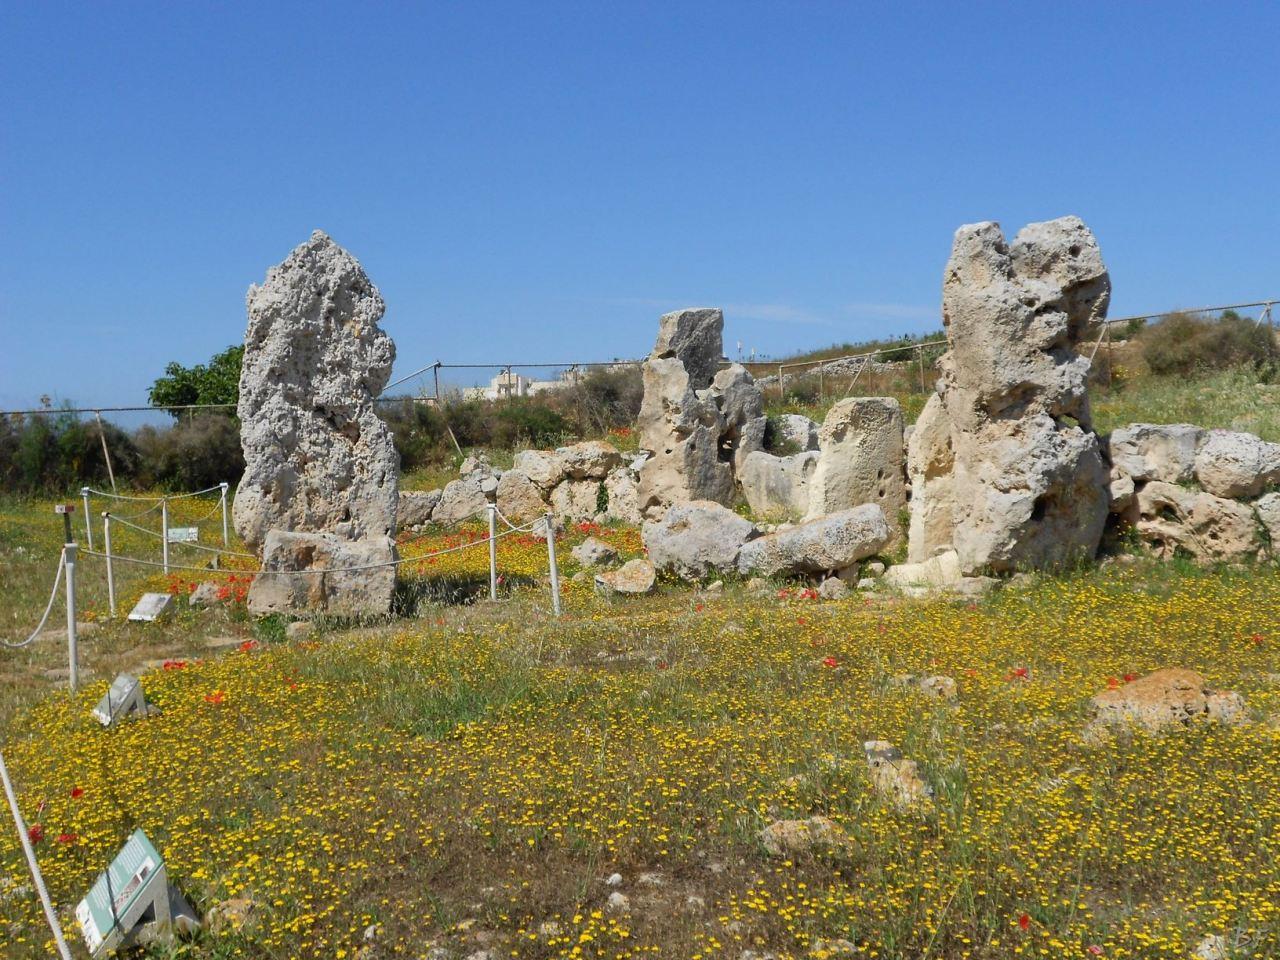 Skorba-Tempio-Megalitico-Mgarr-Malta-3